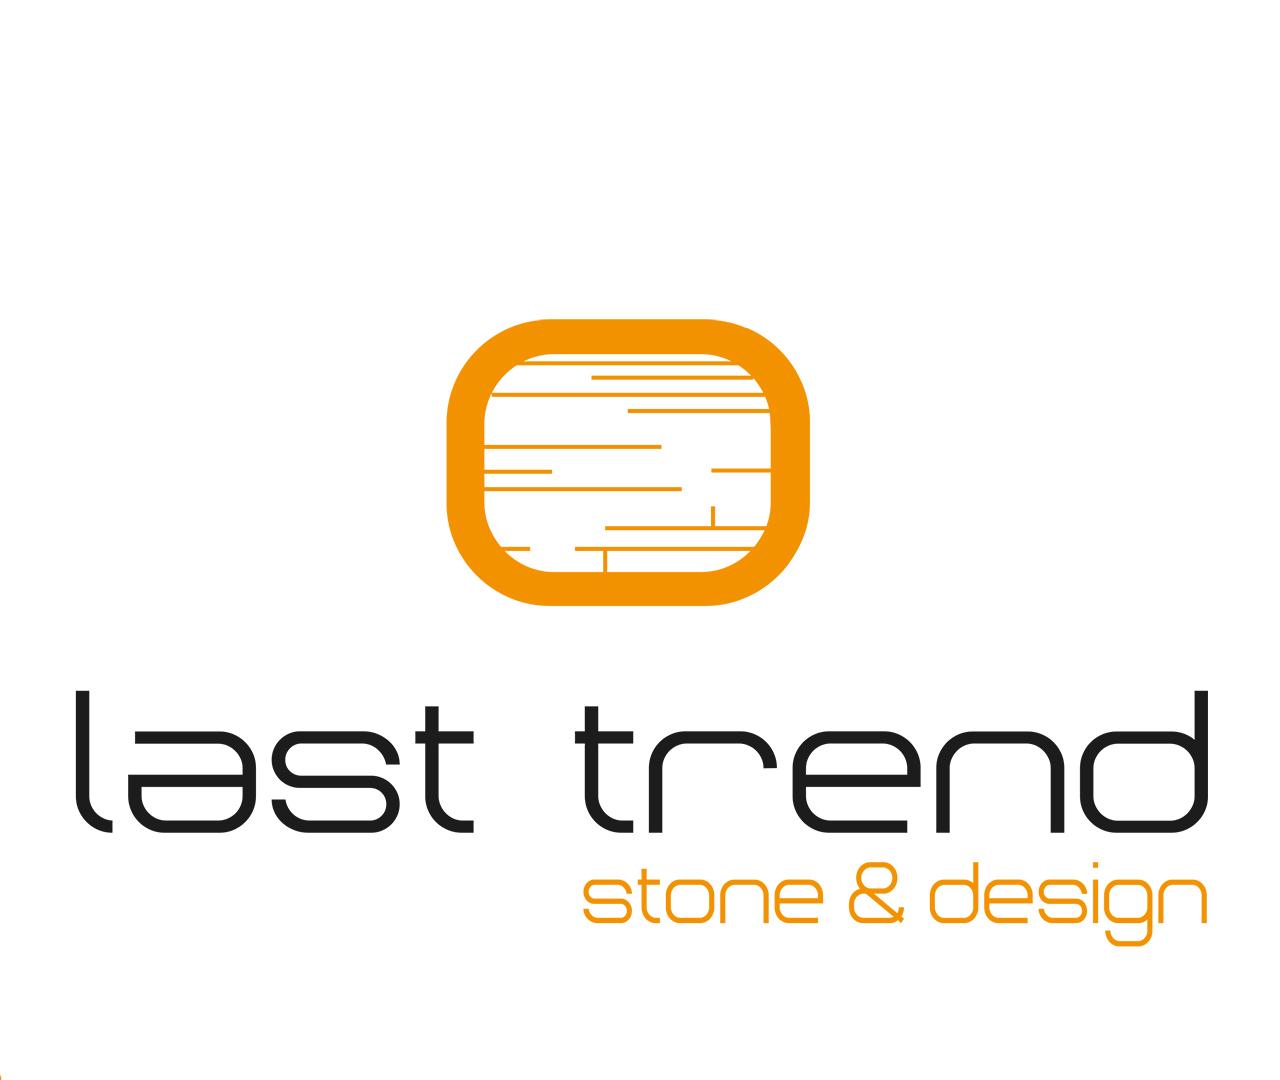 Last Trend